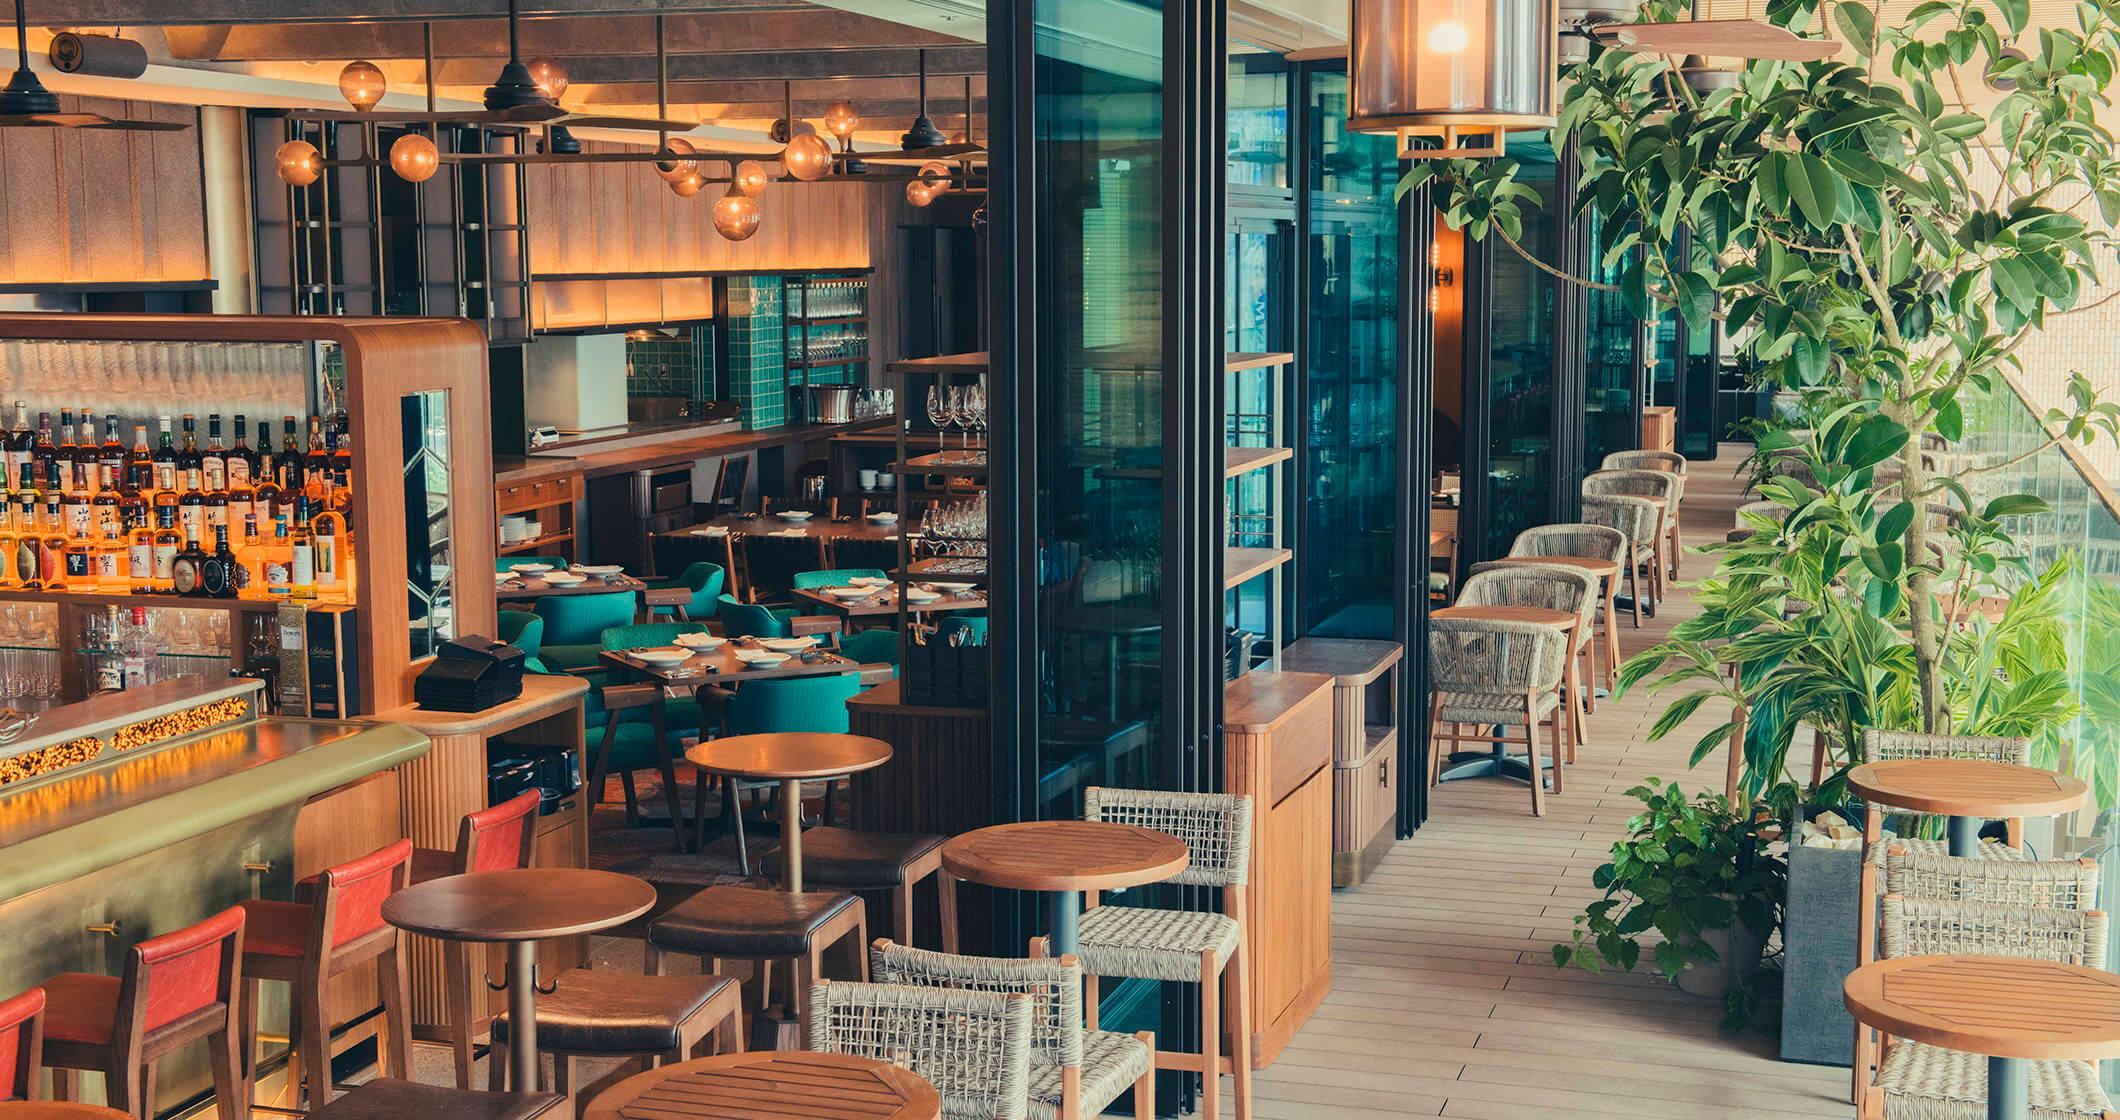 Photo: Restaurant